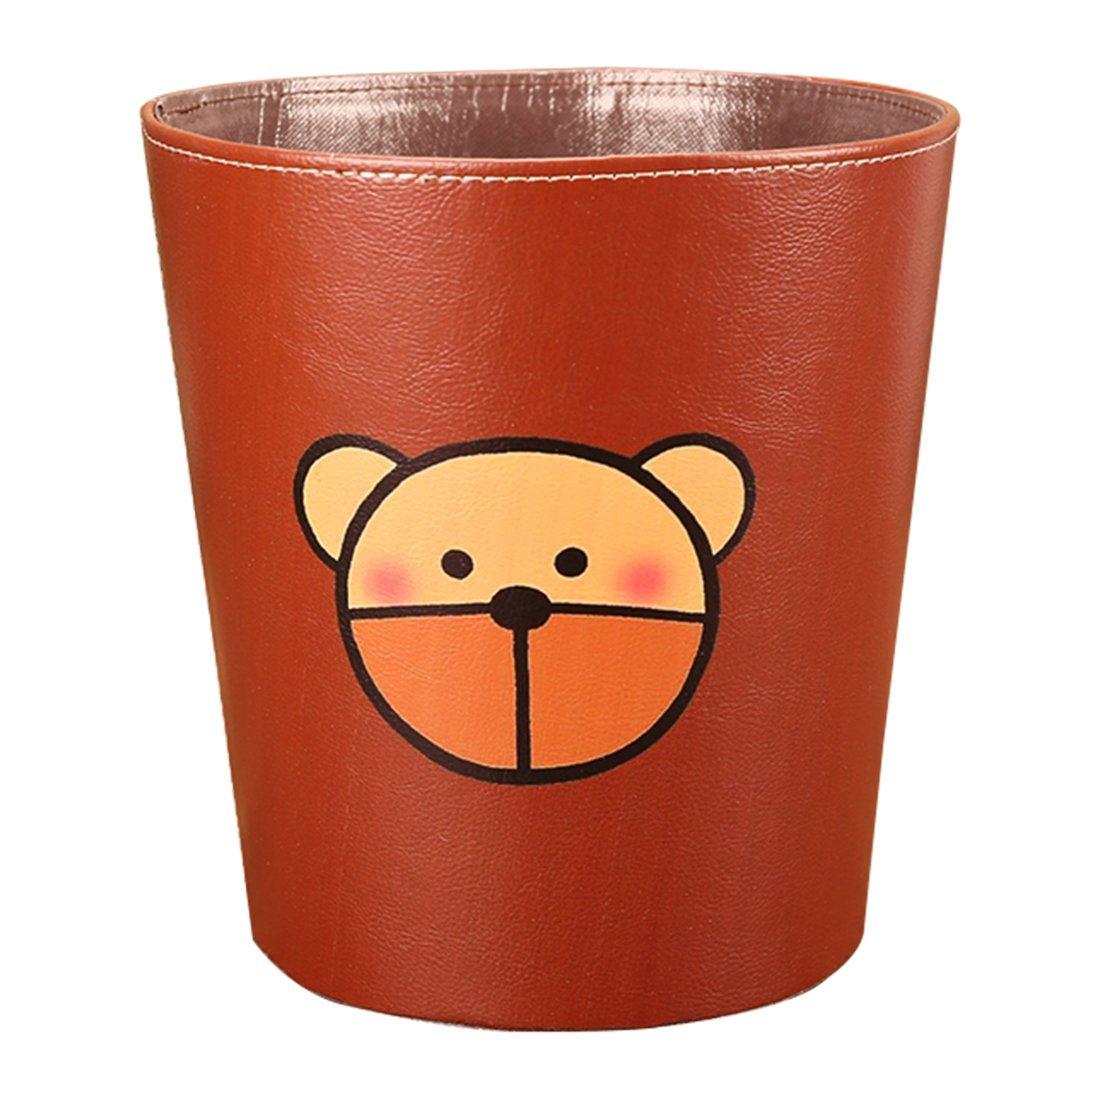 XSHION Bedroom Trash Can, Waste Paper Basket/Garbage Bin Kitchen witout Lid/Open Wastebasket PU Leather Recycle Bin 3.6 Gal